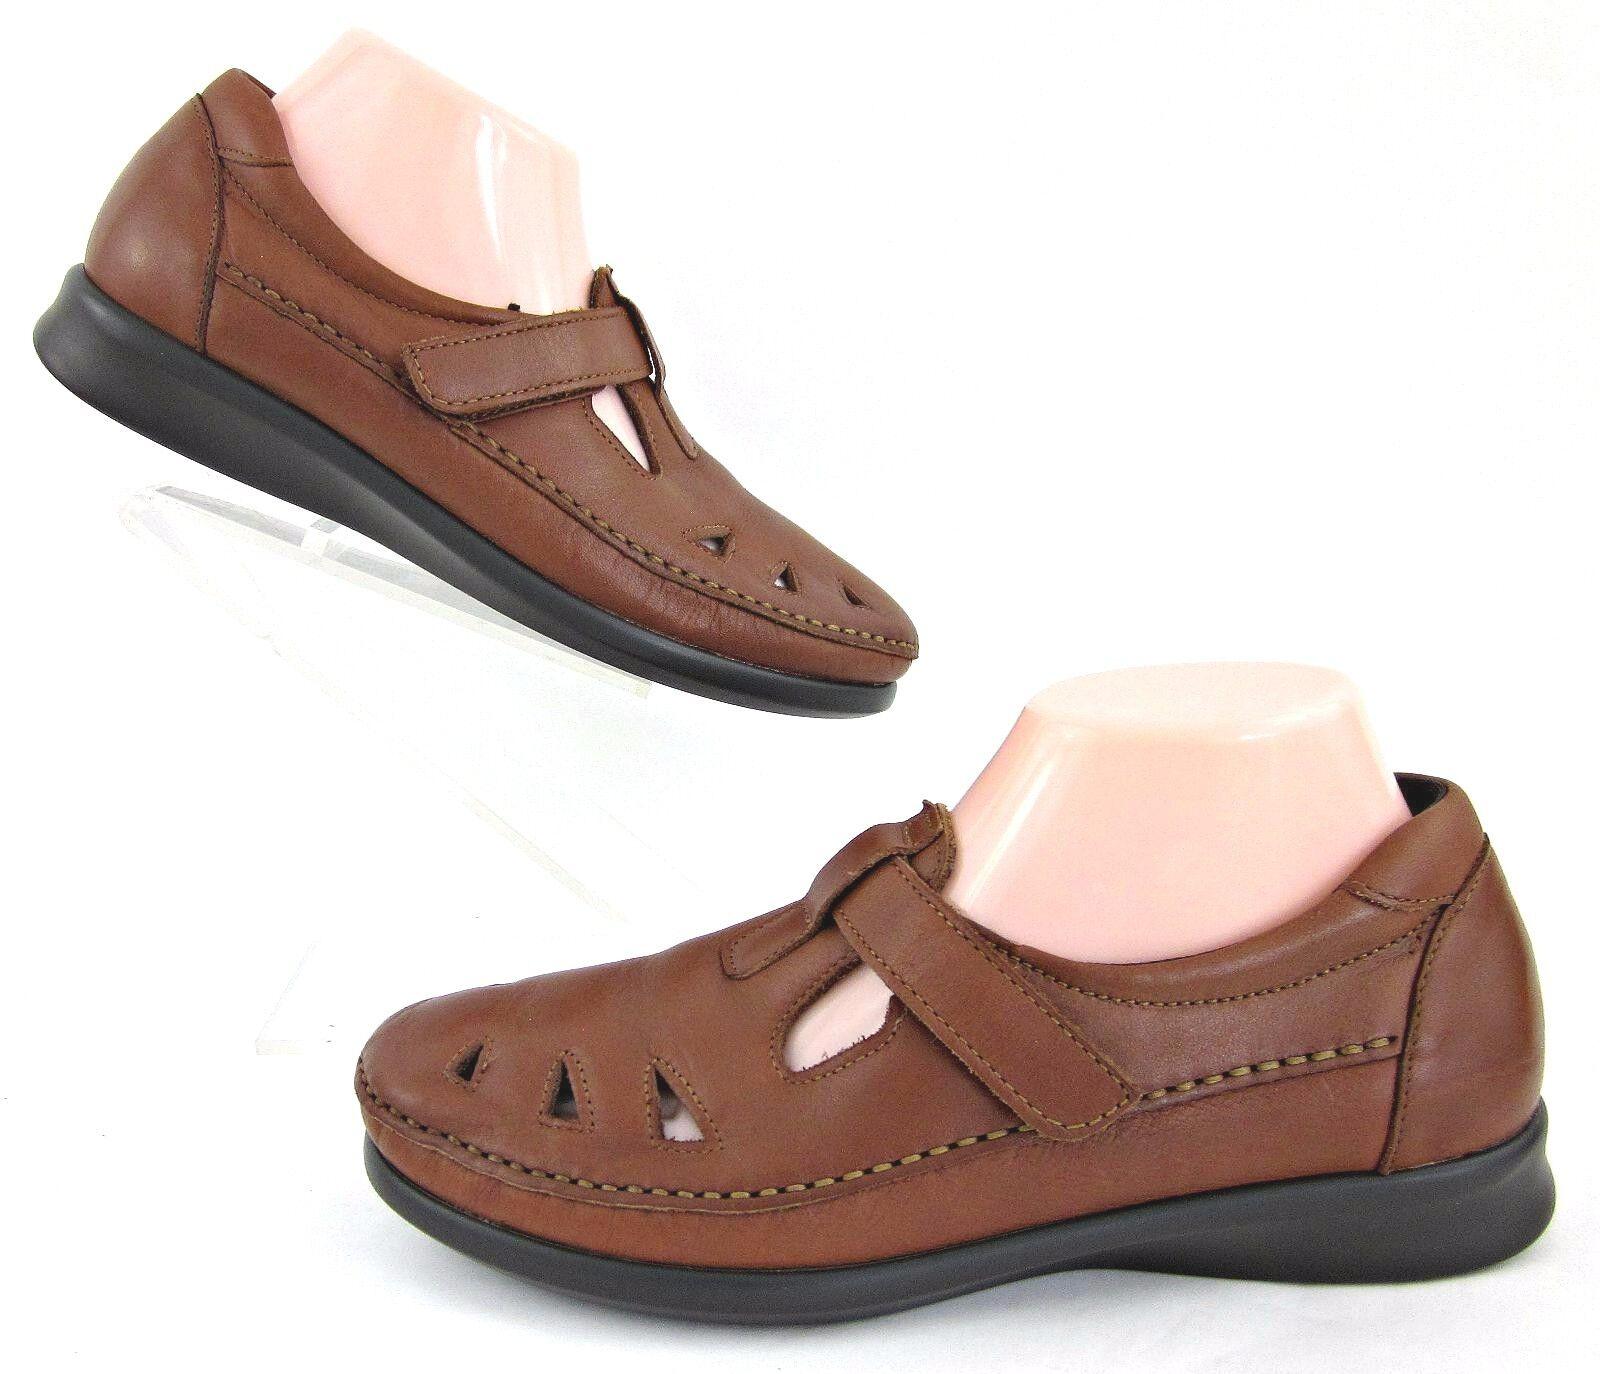 SAS Donna Donna SAS 'Roamer' Slip On Tripad Comfort Chestnut Scarpe Chestnut Comfort   df3944